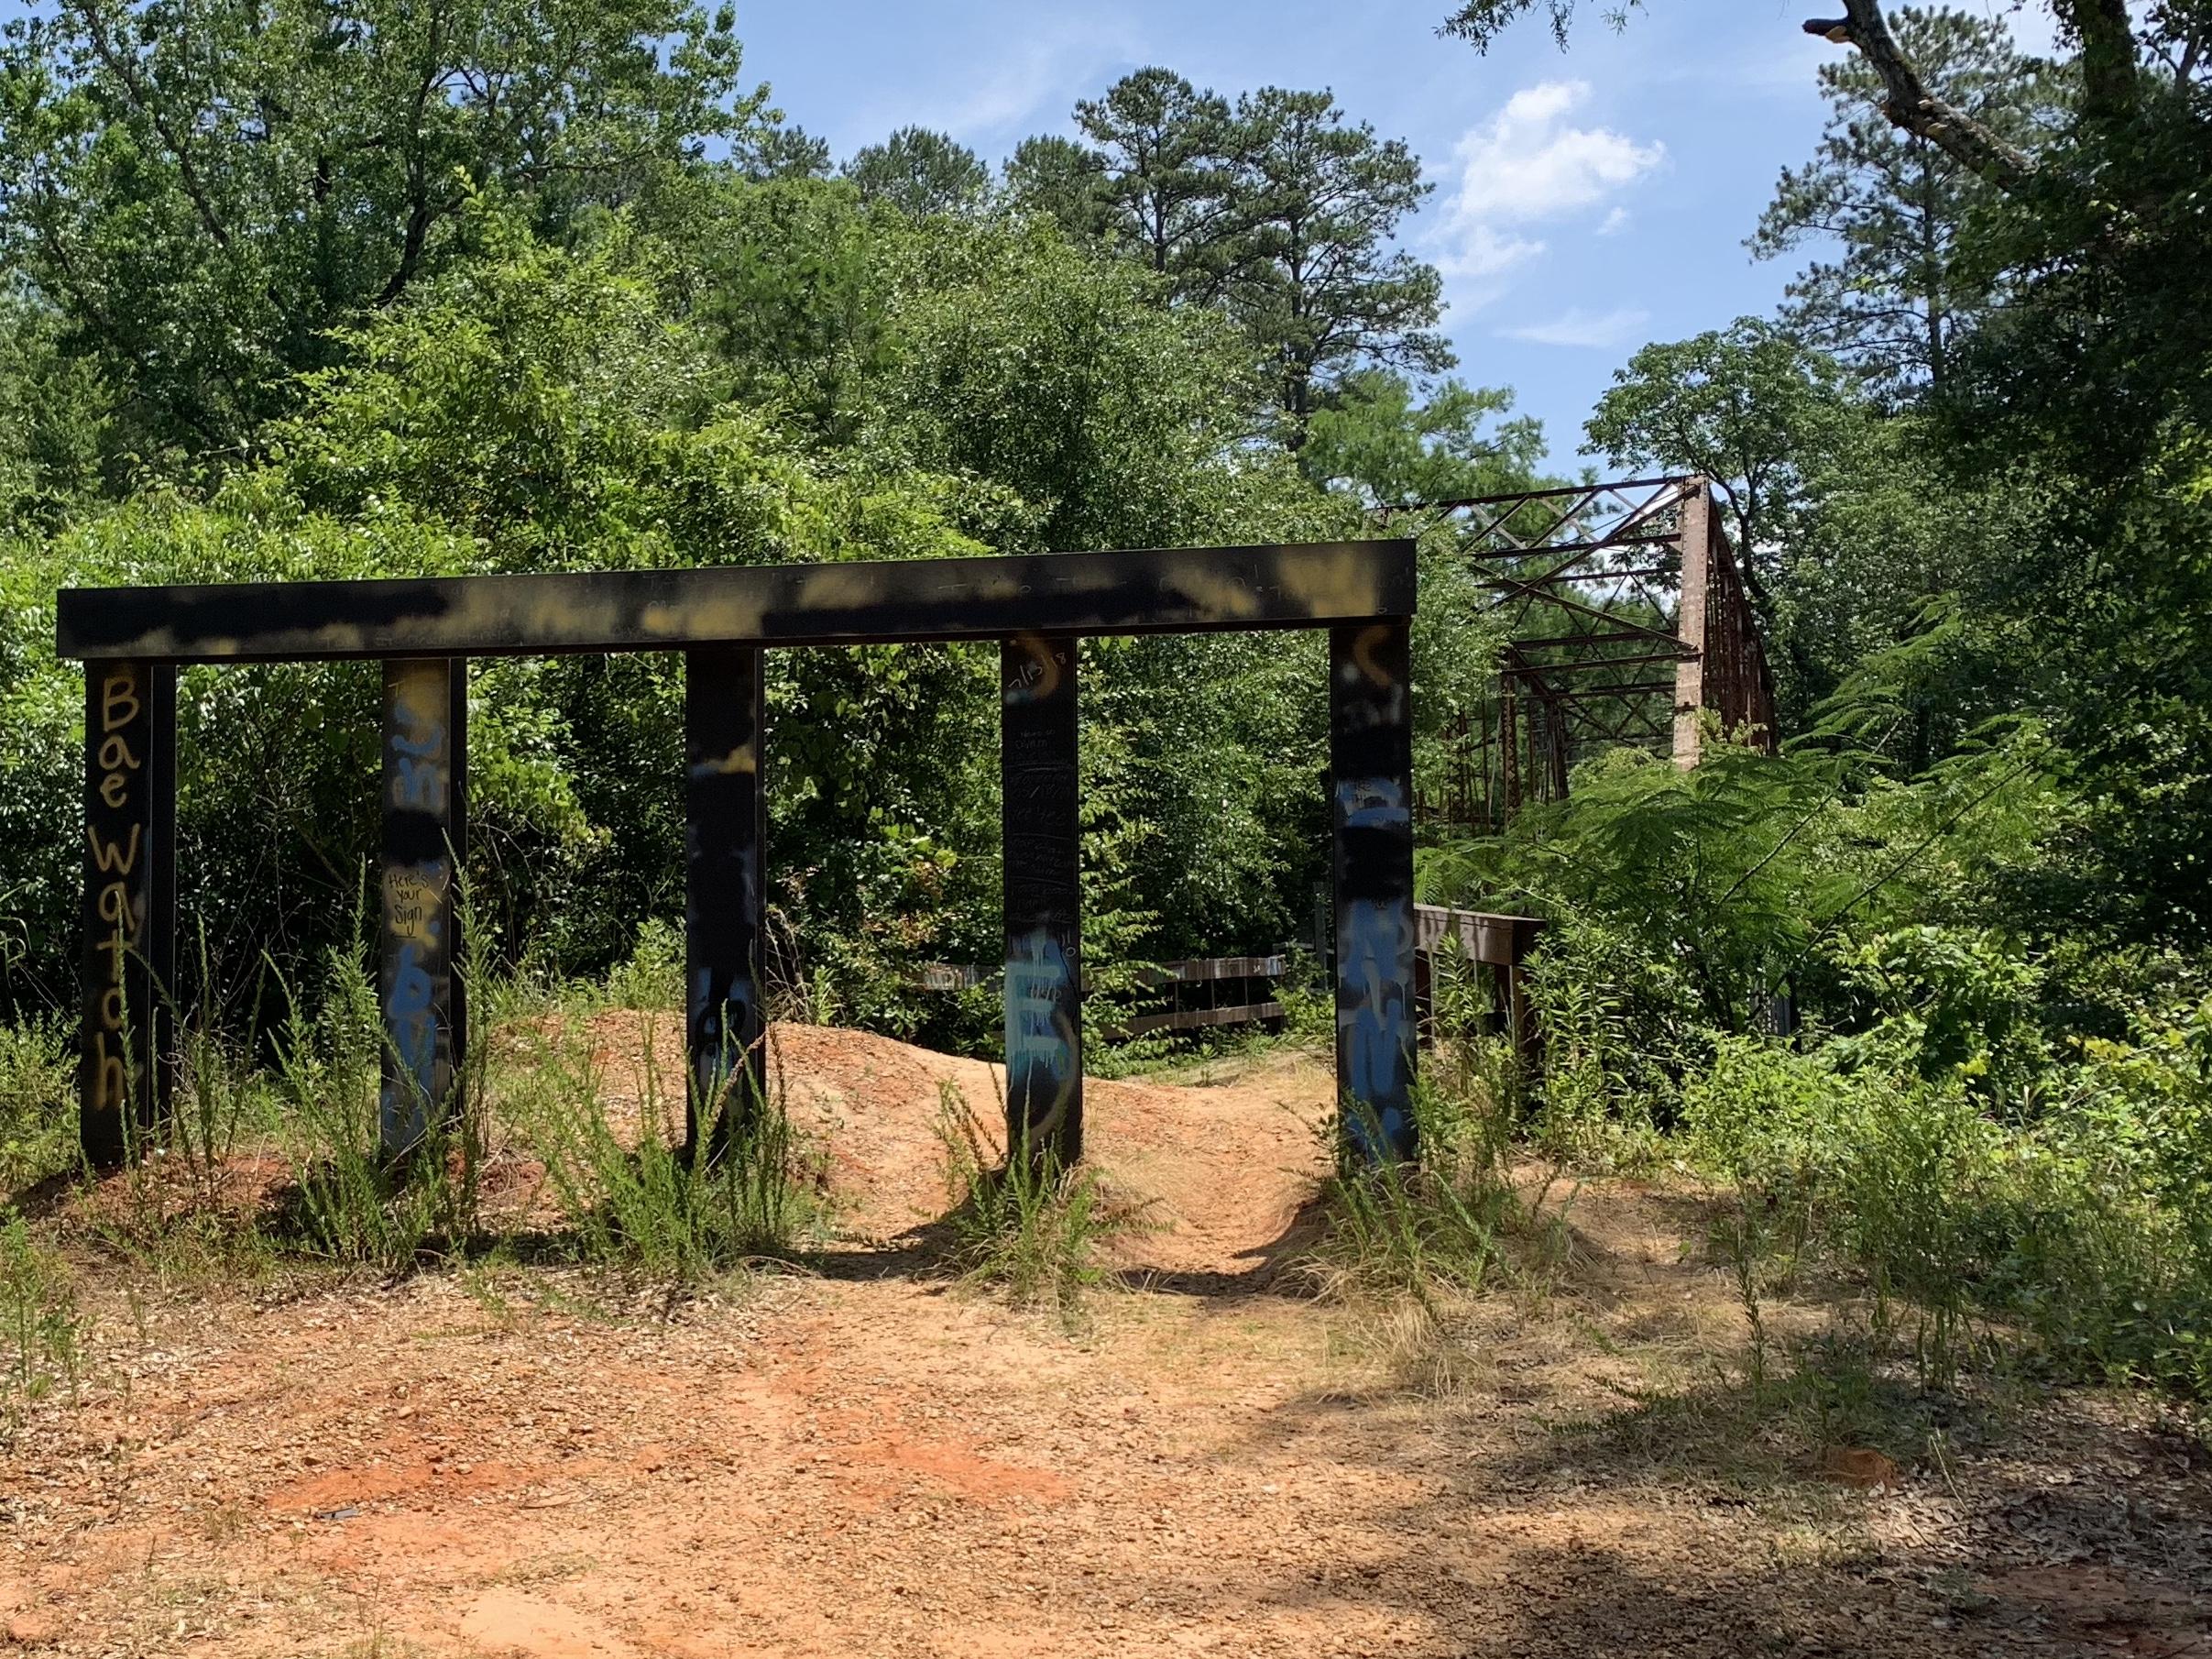 stuckeys-bridge-meridian